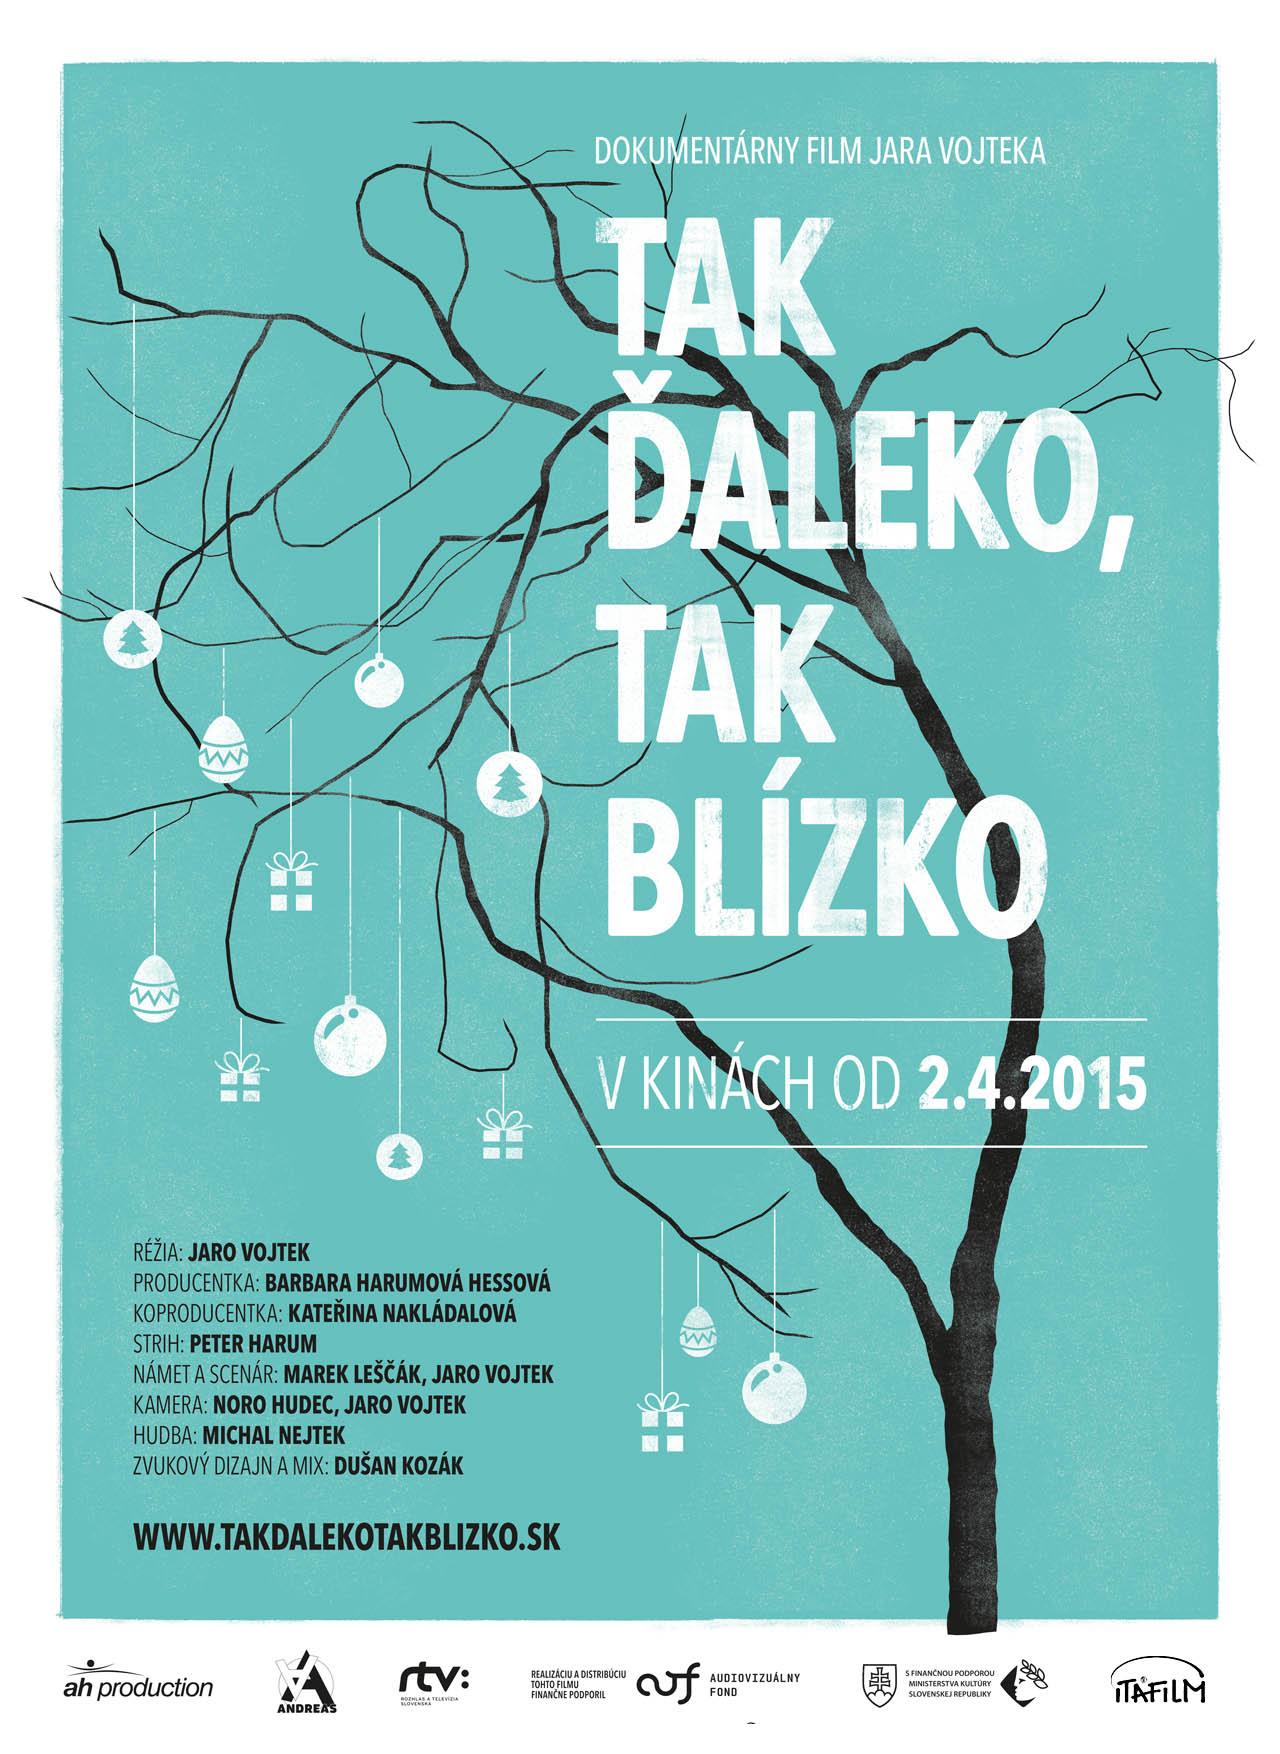 eb0b3fe6c Tak ďaleko, tak blízko - Jaro Vojtek, dokumentárny film